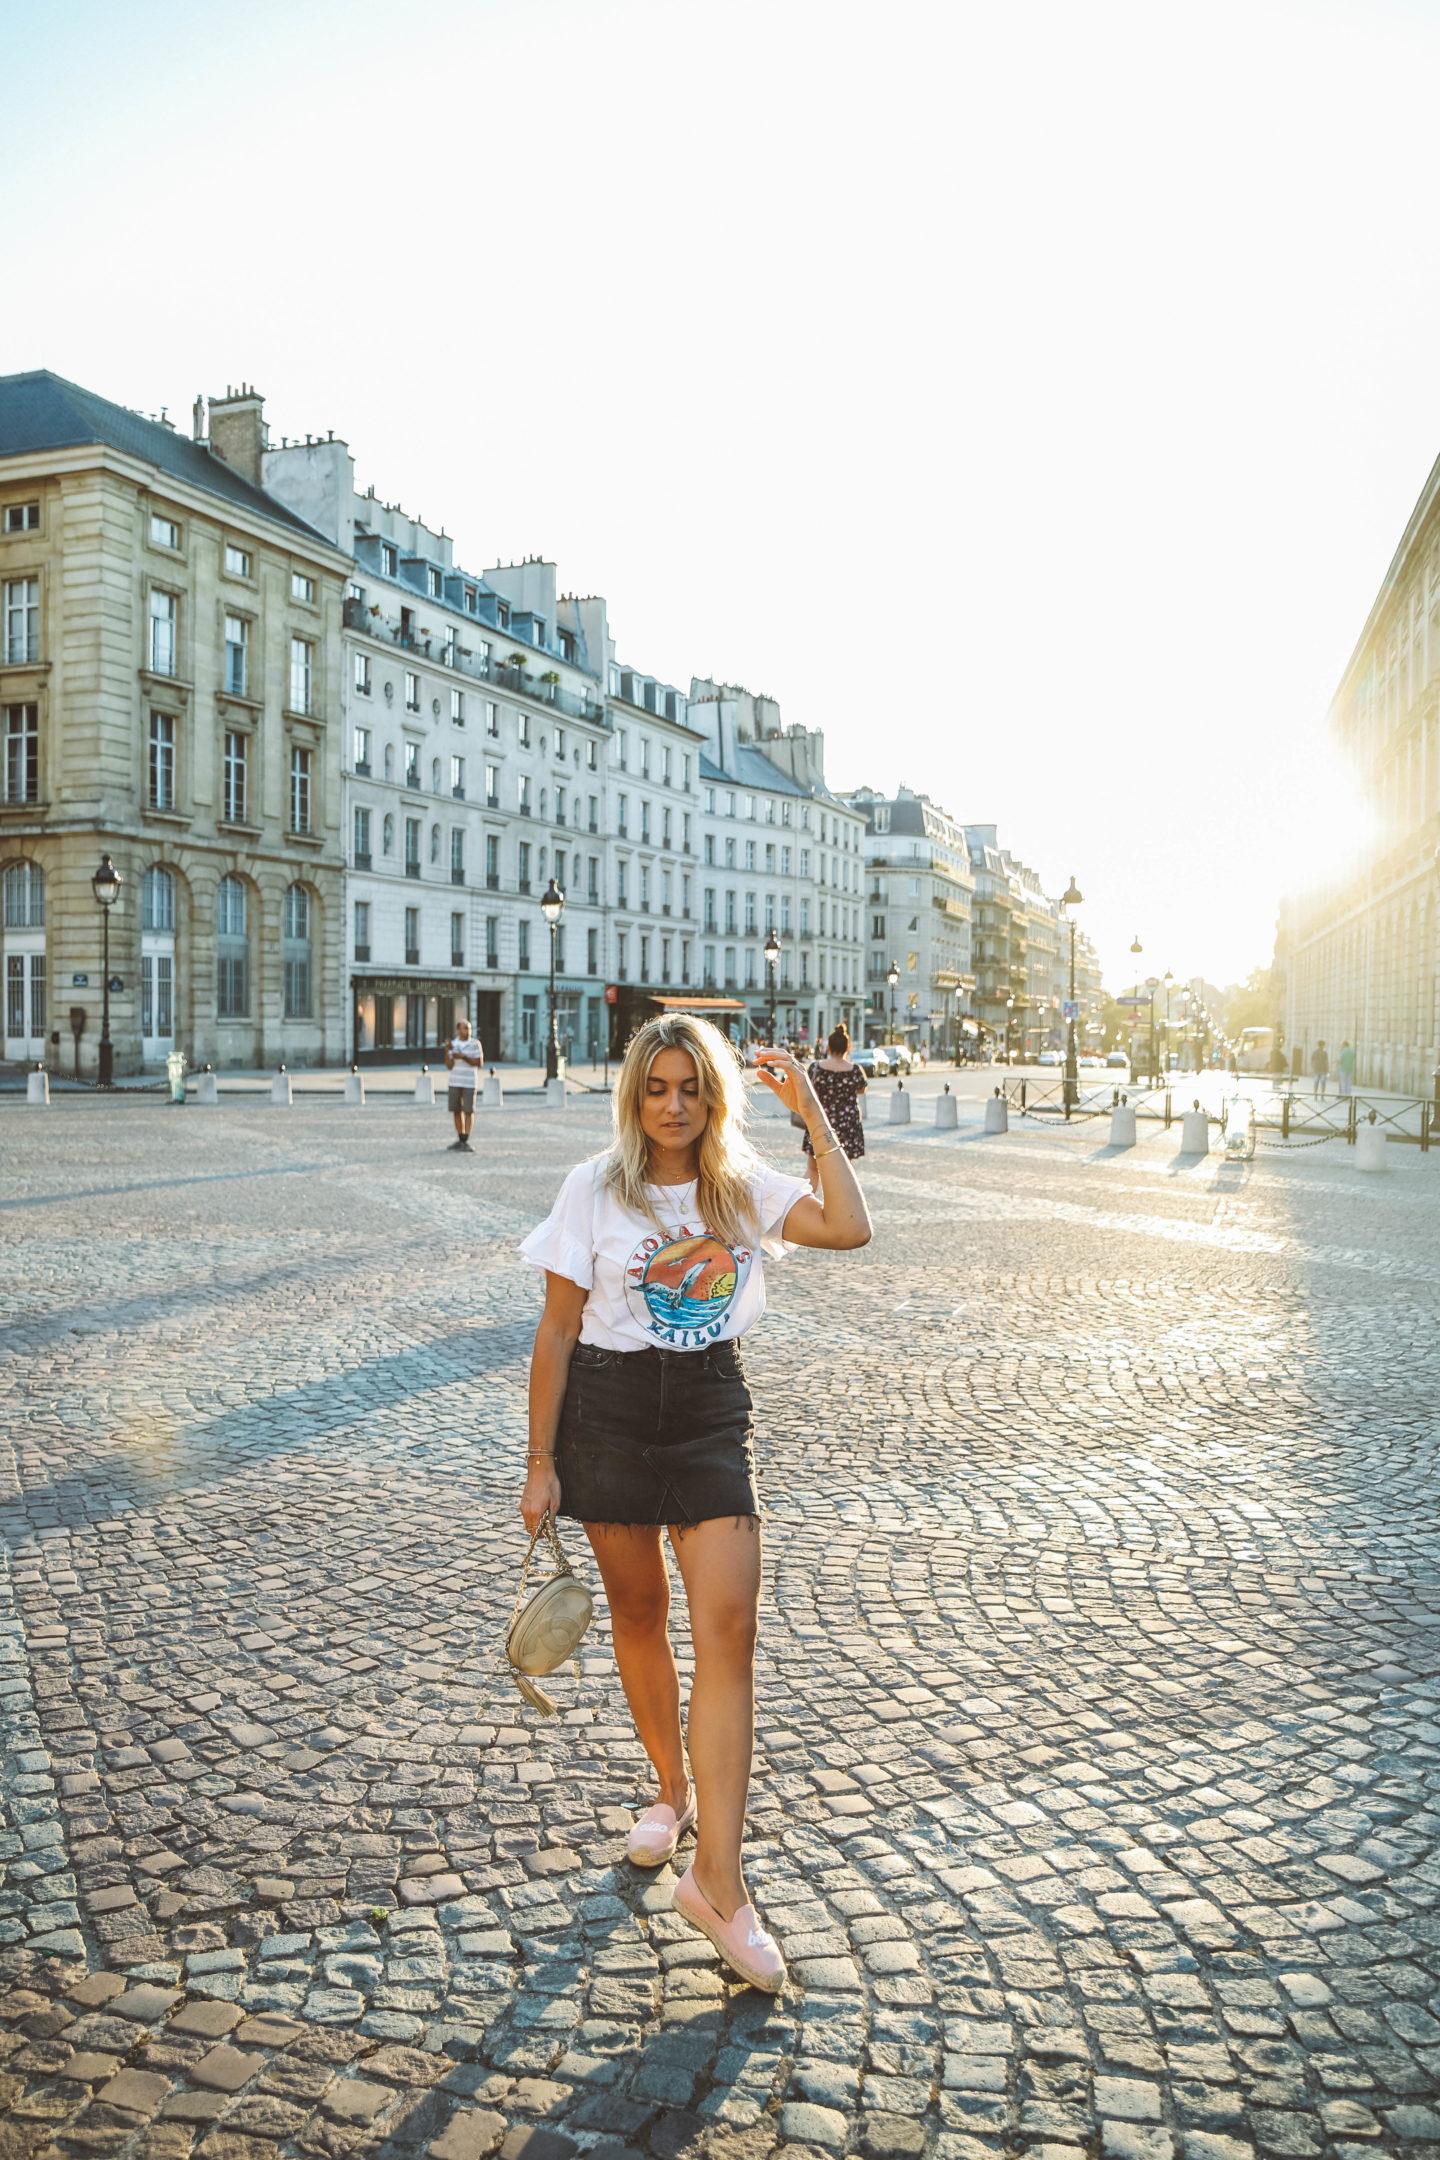 Espadrilles Soludos - Blondie Baby blog mode Paris et voyages